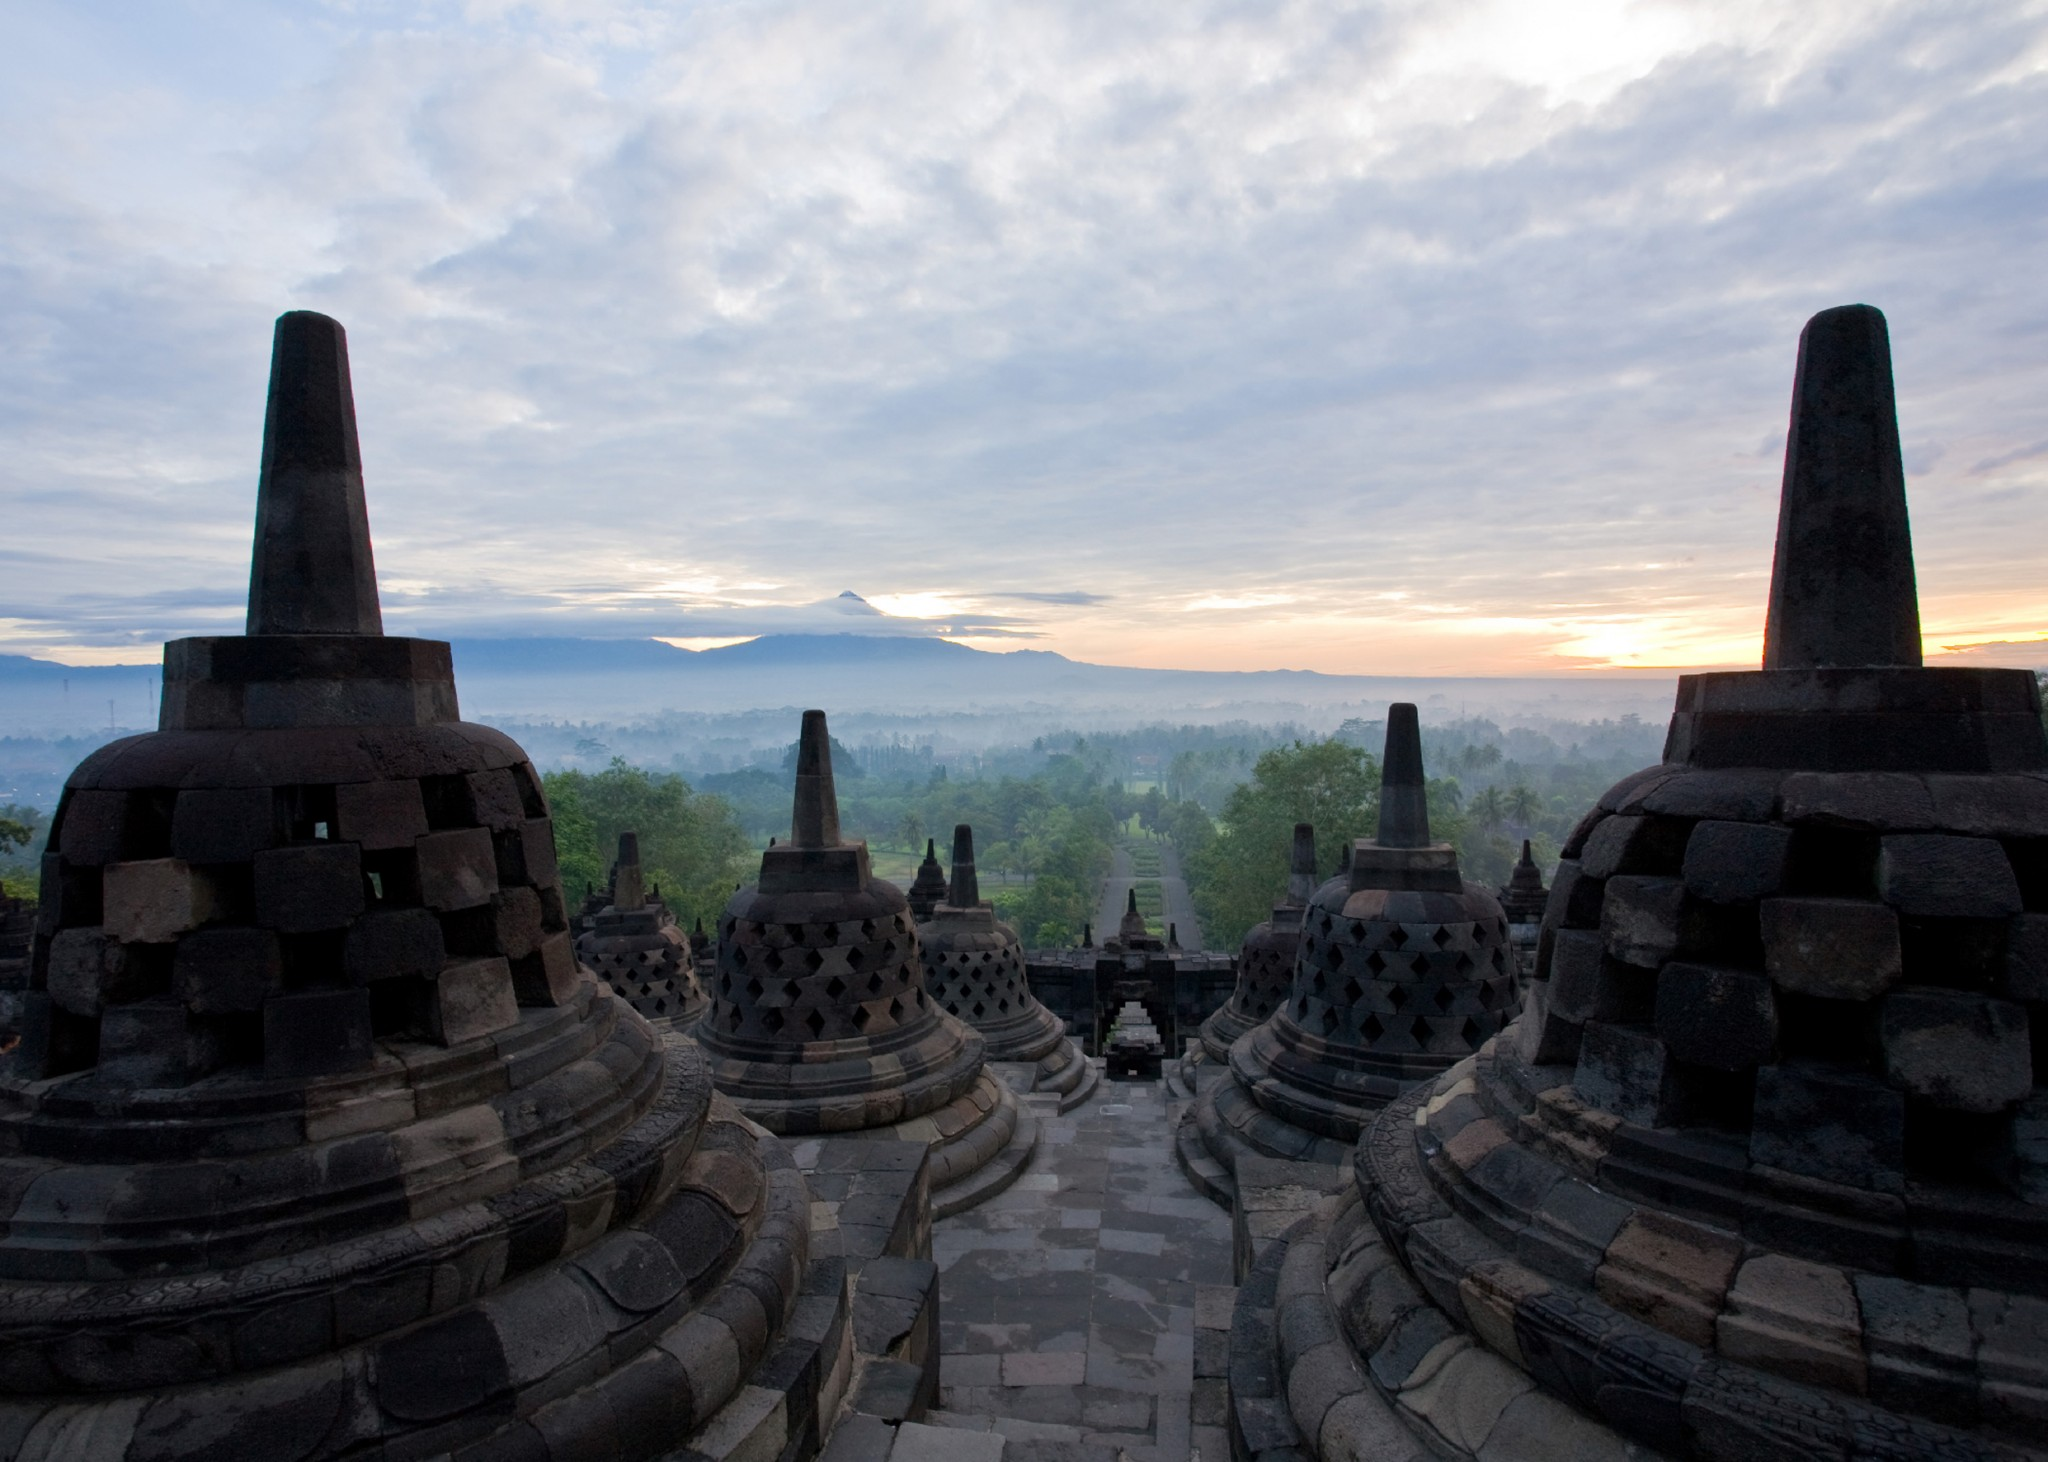 Indonesië, Borobudur temple in Yogyakarta